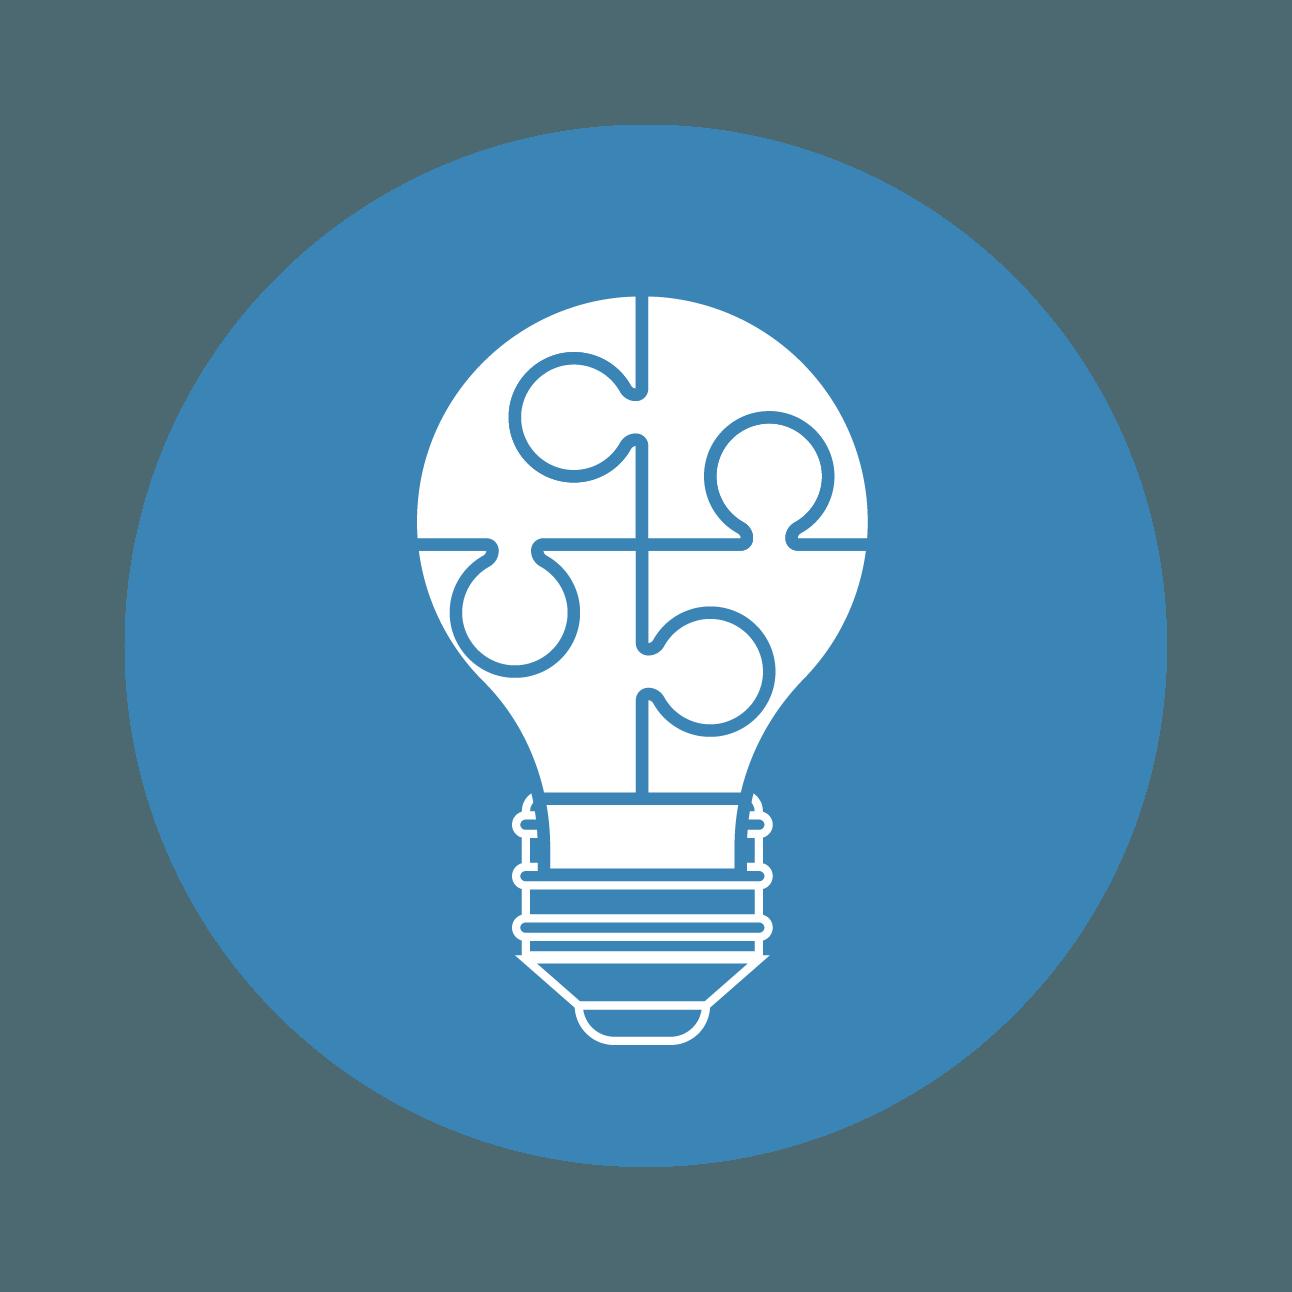 Icon for the Socratic Method